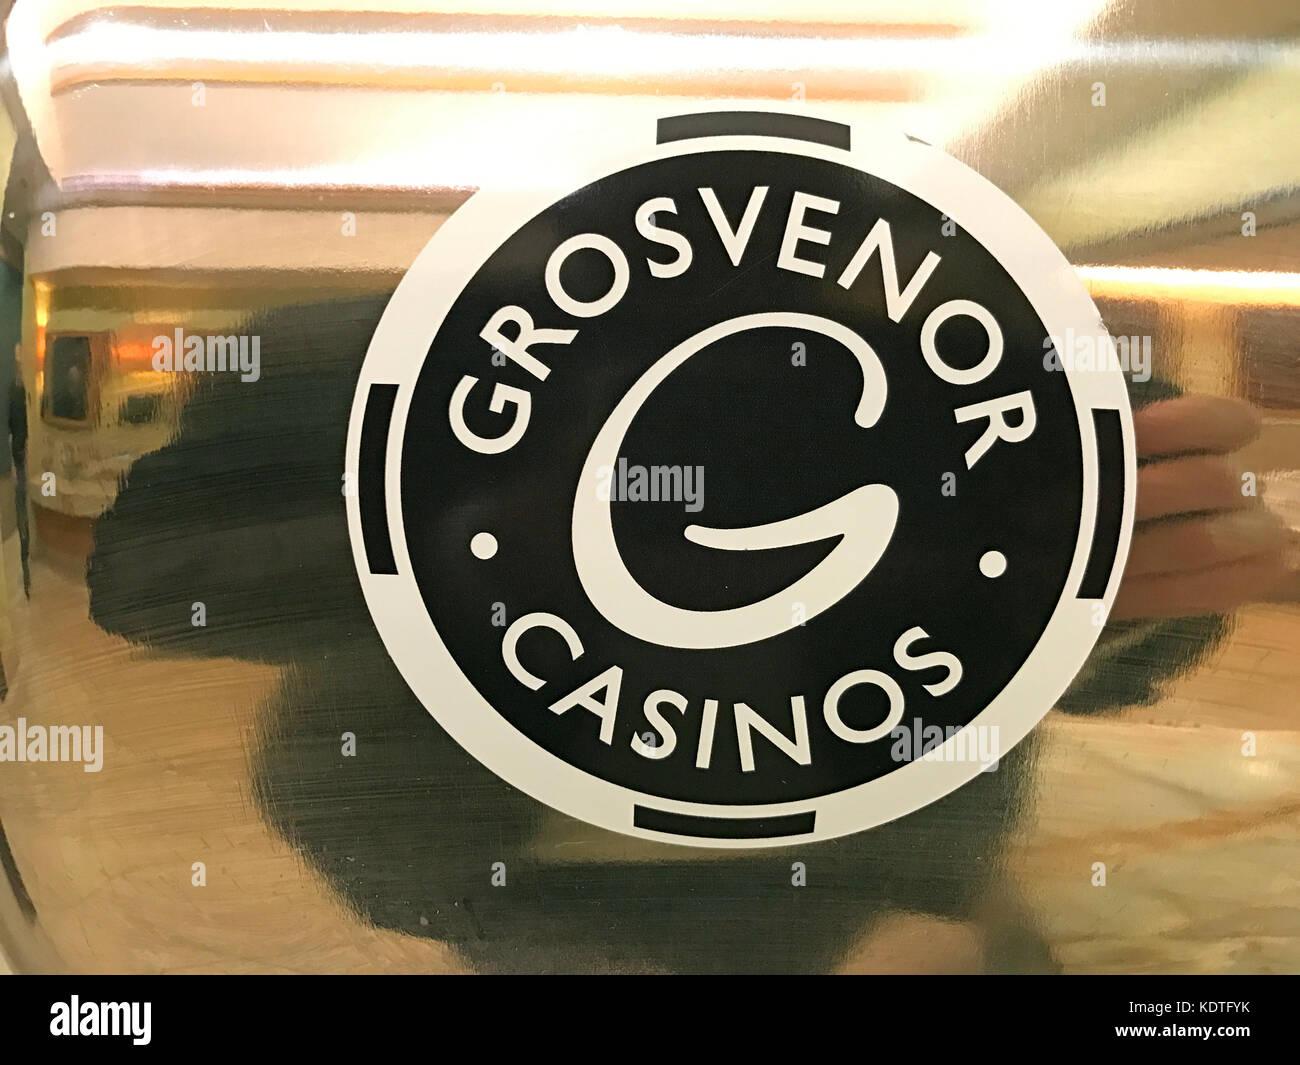 Grosvenor Casino Logo - Stock Image